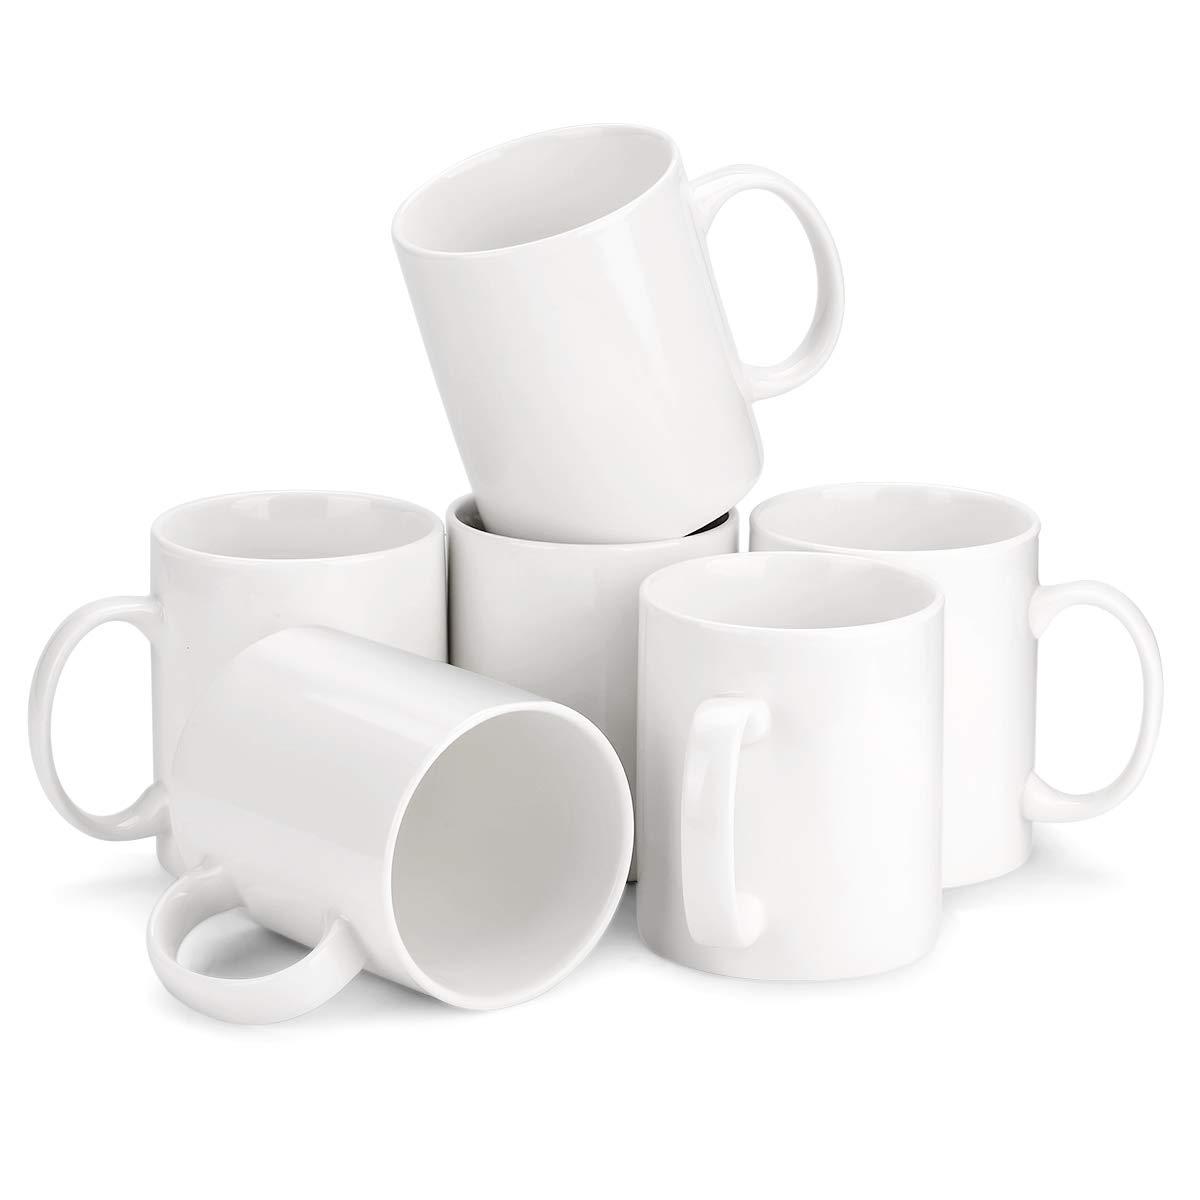 MIWARE Porcelain Coffee Mug Set - 12 Ounce for Coffee, Tea, Cocoa, Set of 6 Mugs, White